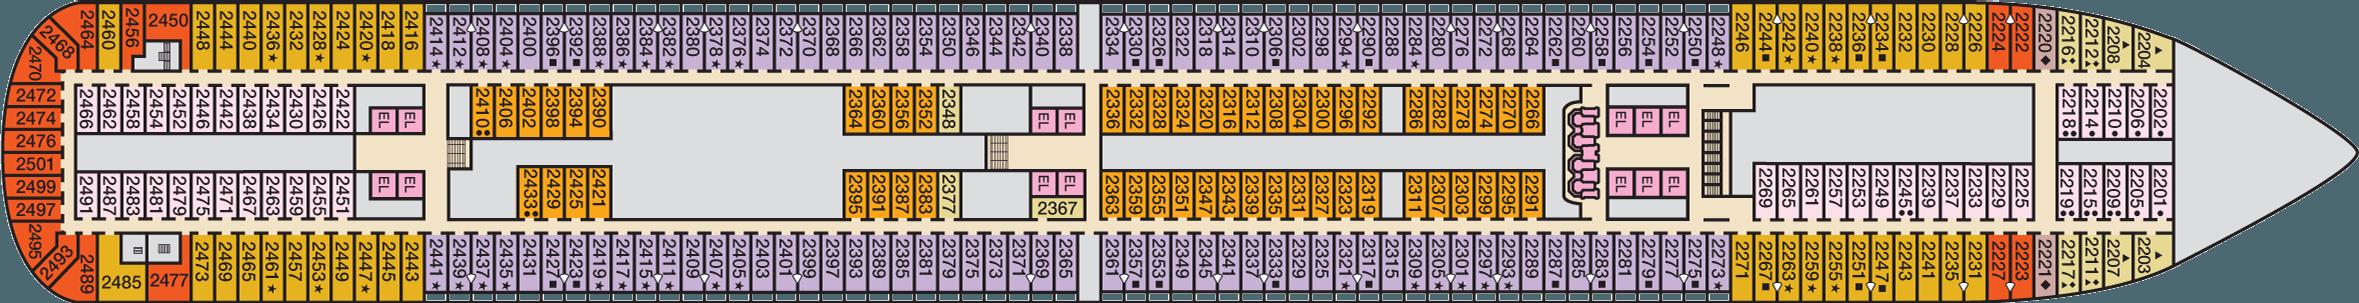 Deck 2 Main